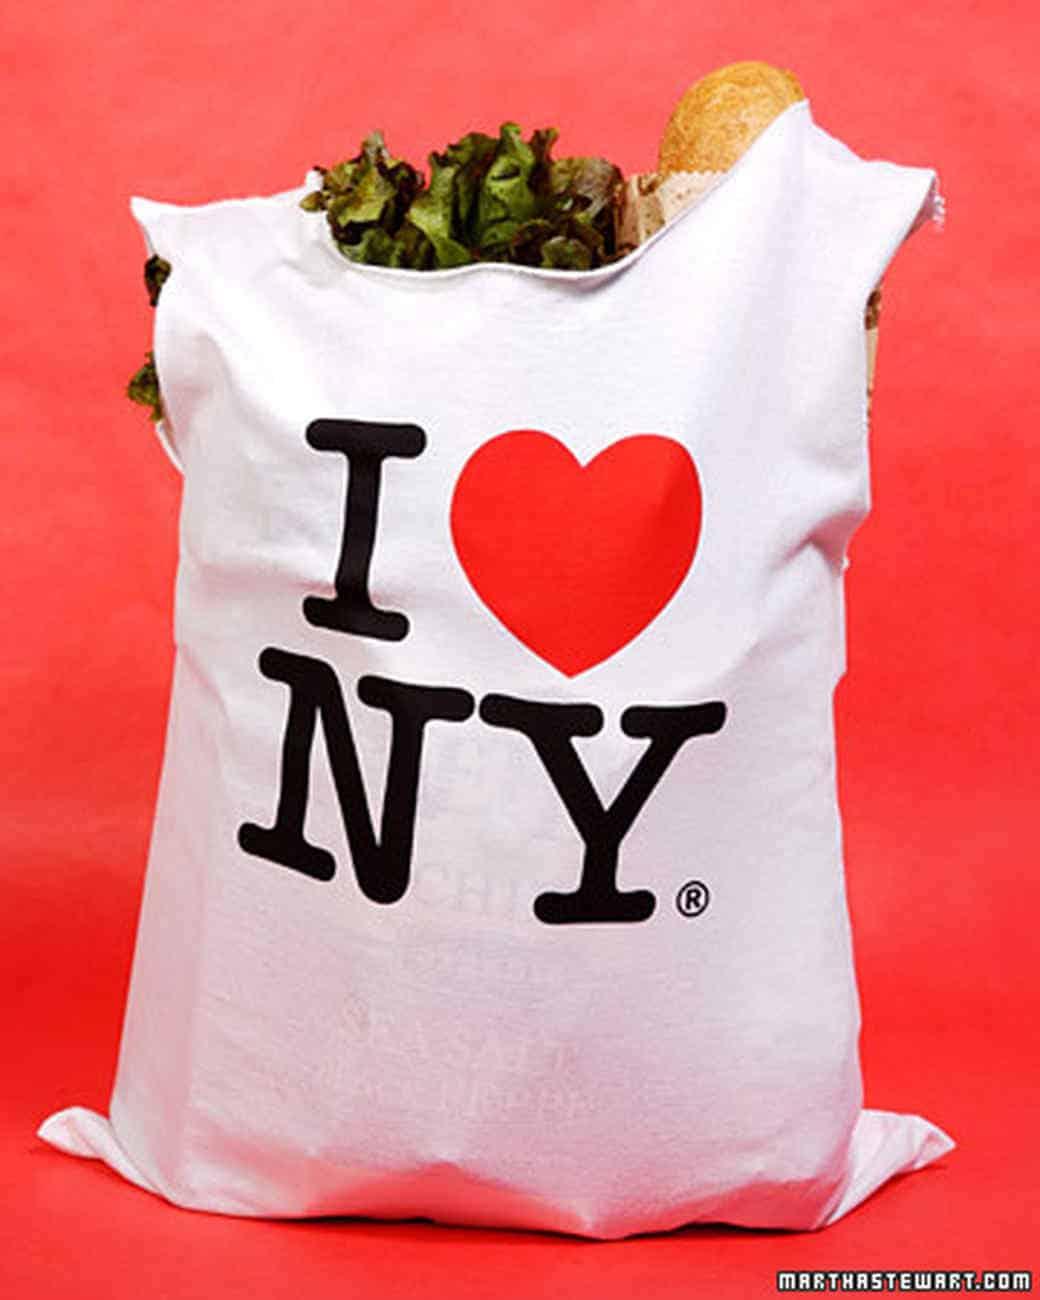 Old t-shirt shopping bag